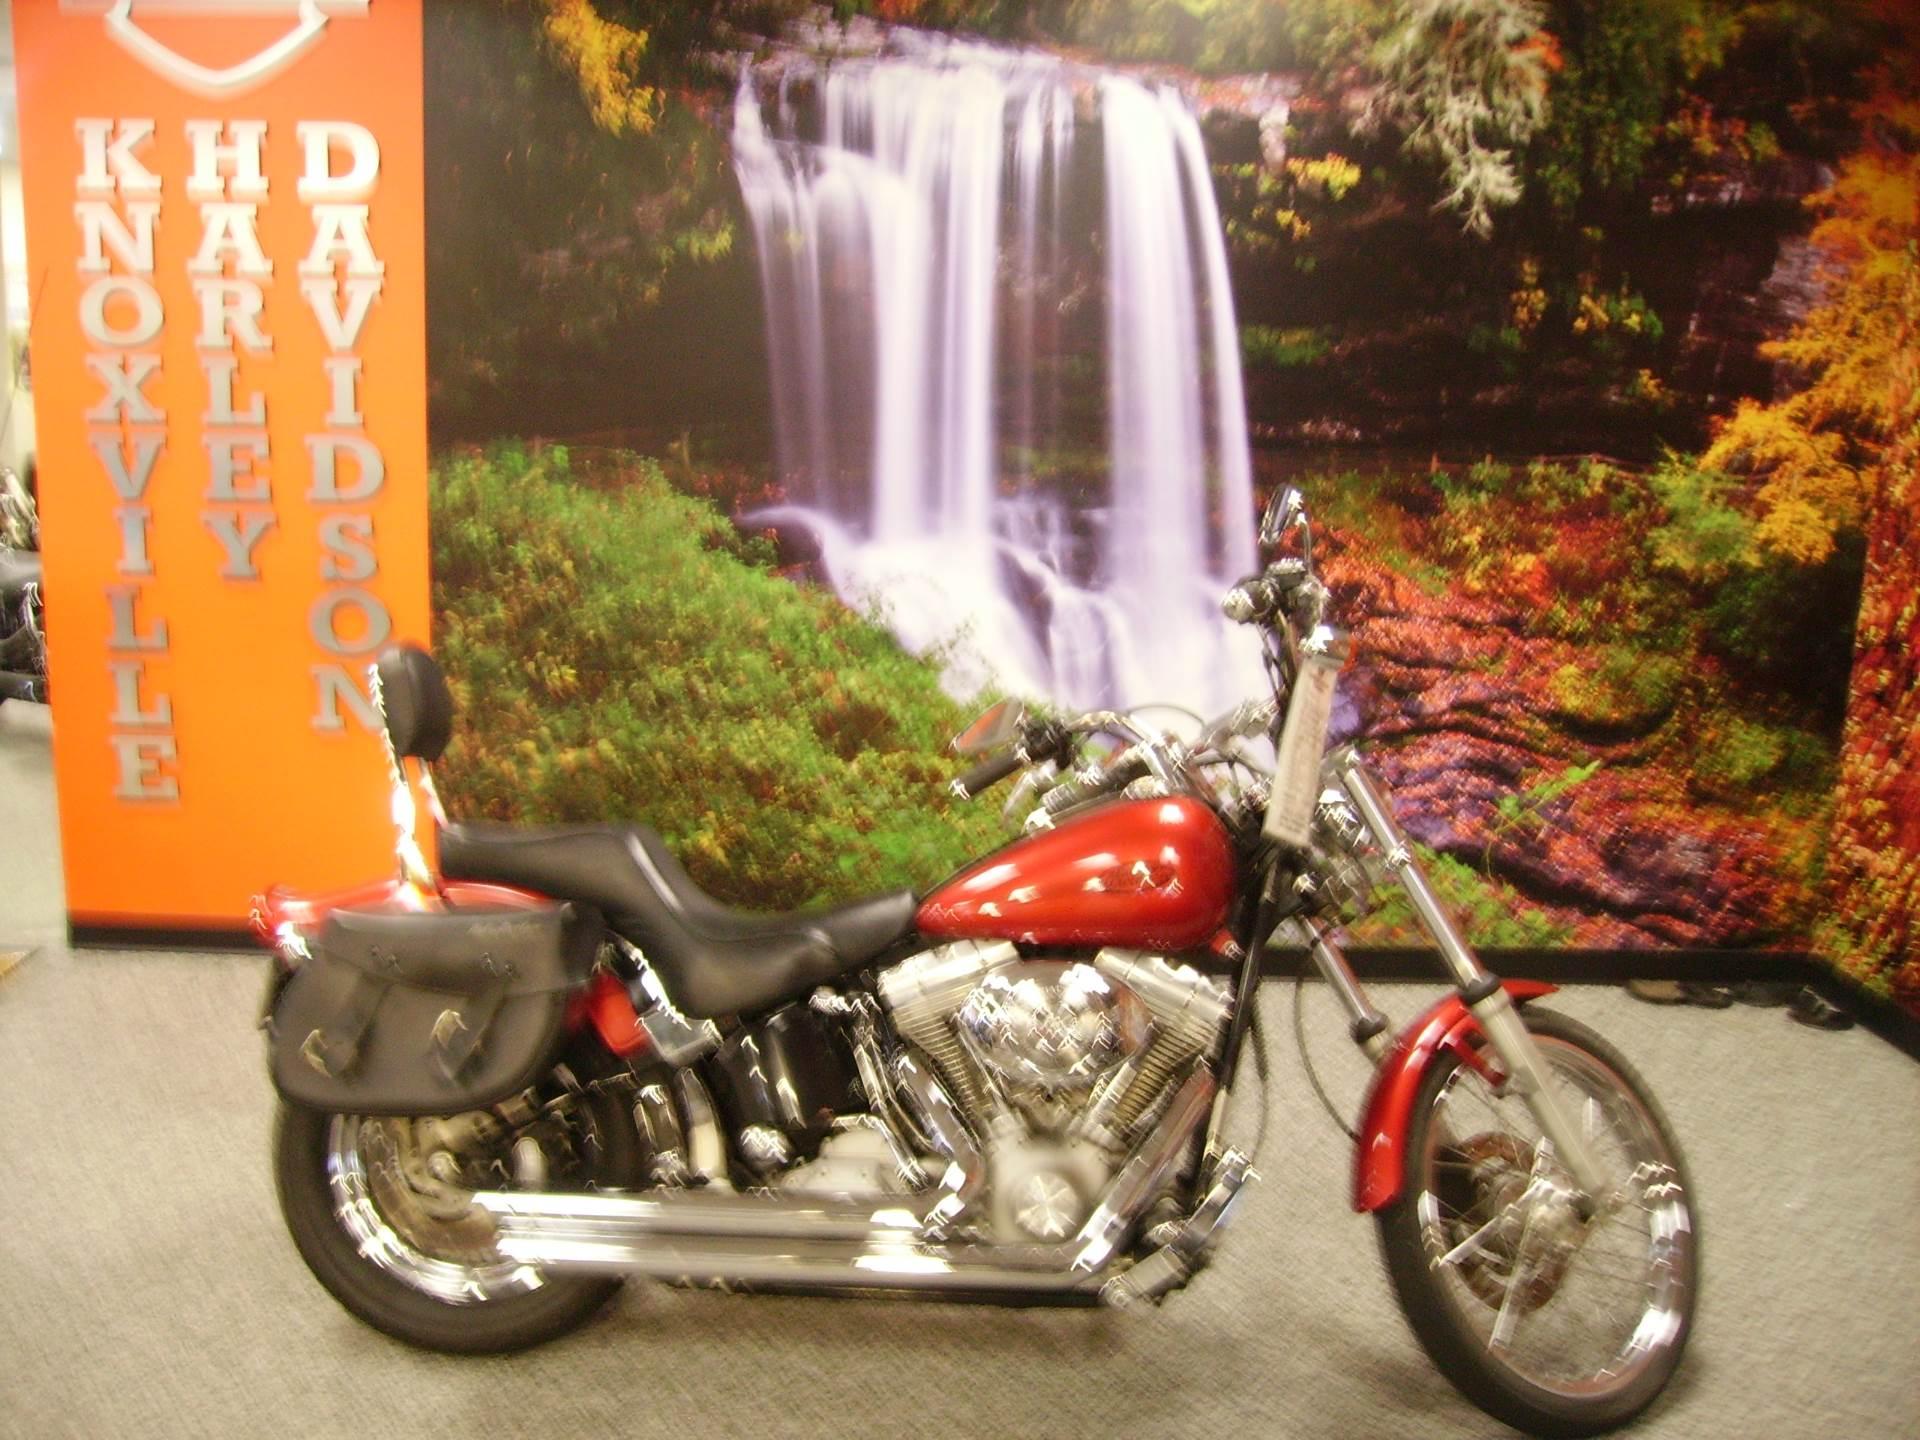 2004 Harley-Davidson FXST/FXSTI Softail® Standard in Knoxville, Tennessee